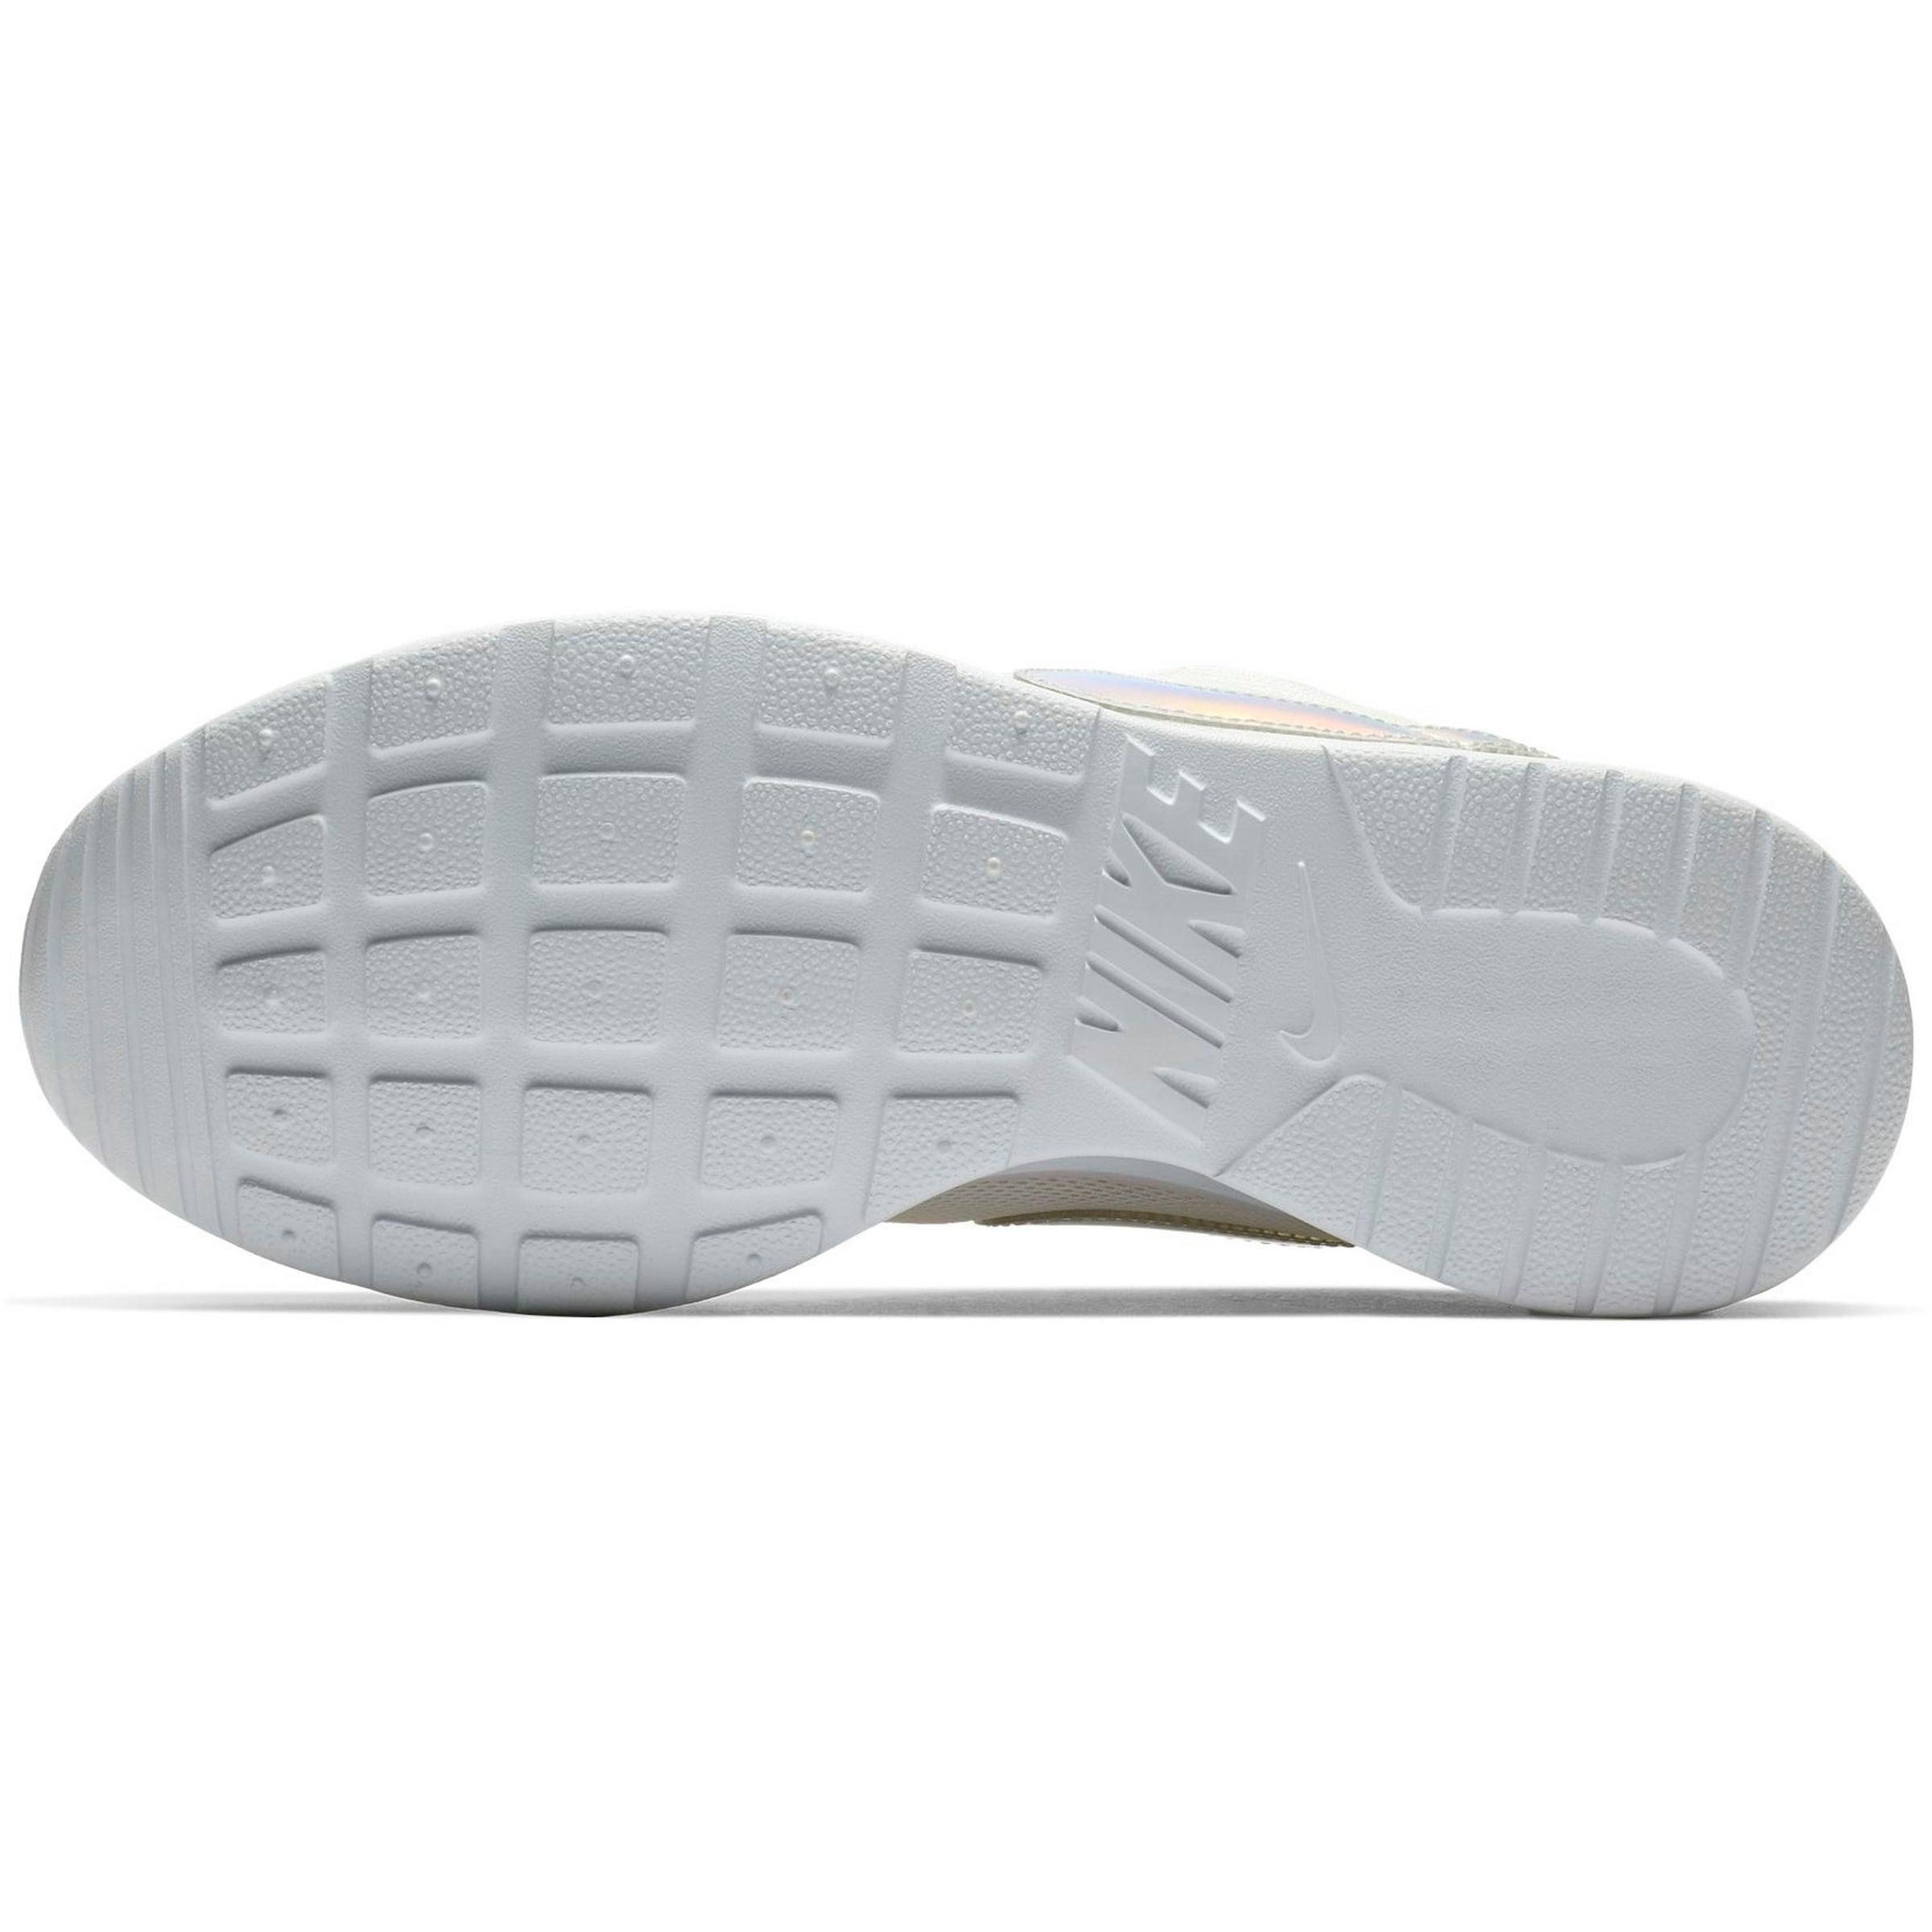 Nike Sportswear Turnschuhe Turnschuhe Turnschuhe 'Tanjun Textil Wilde Freizeitschuhe 180445